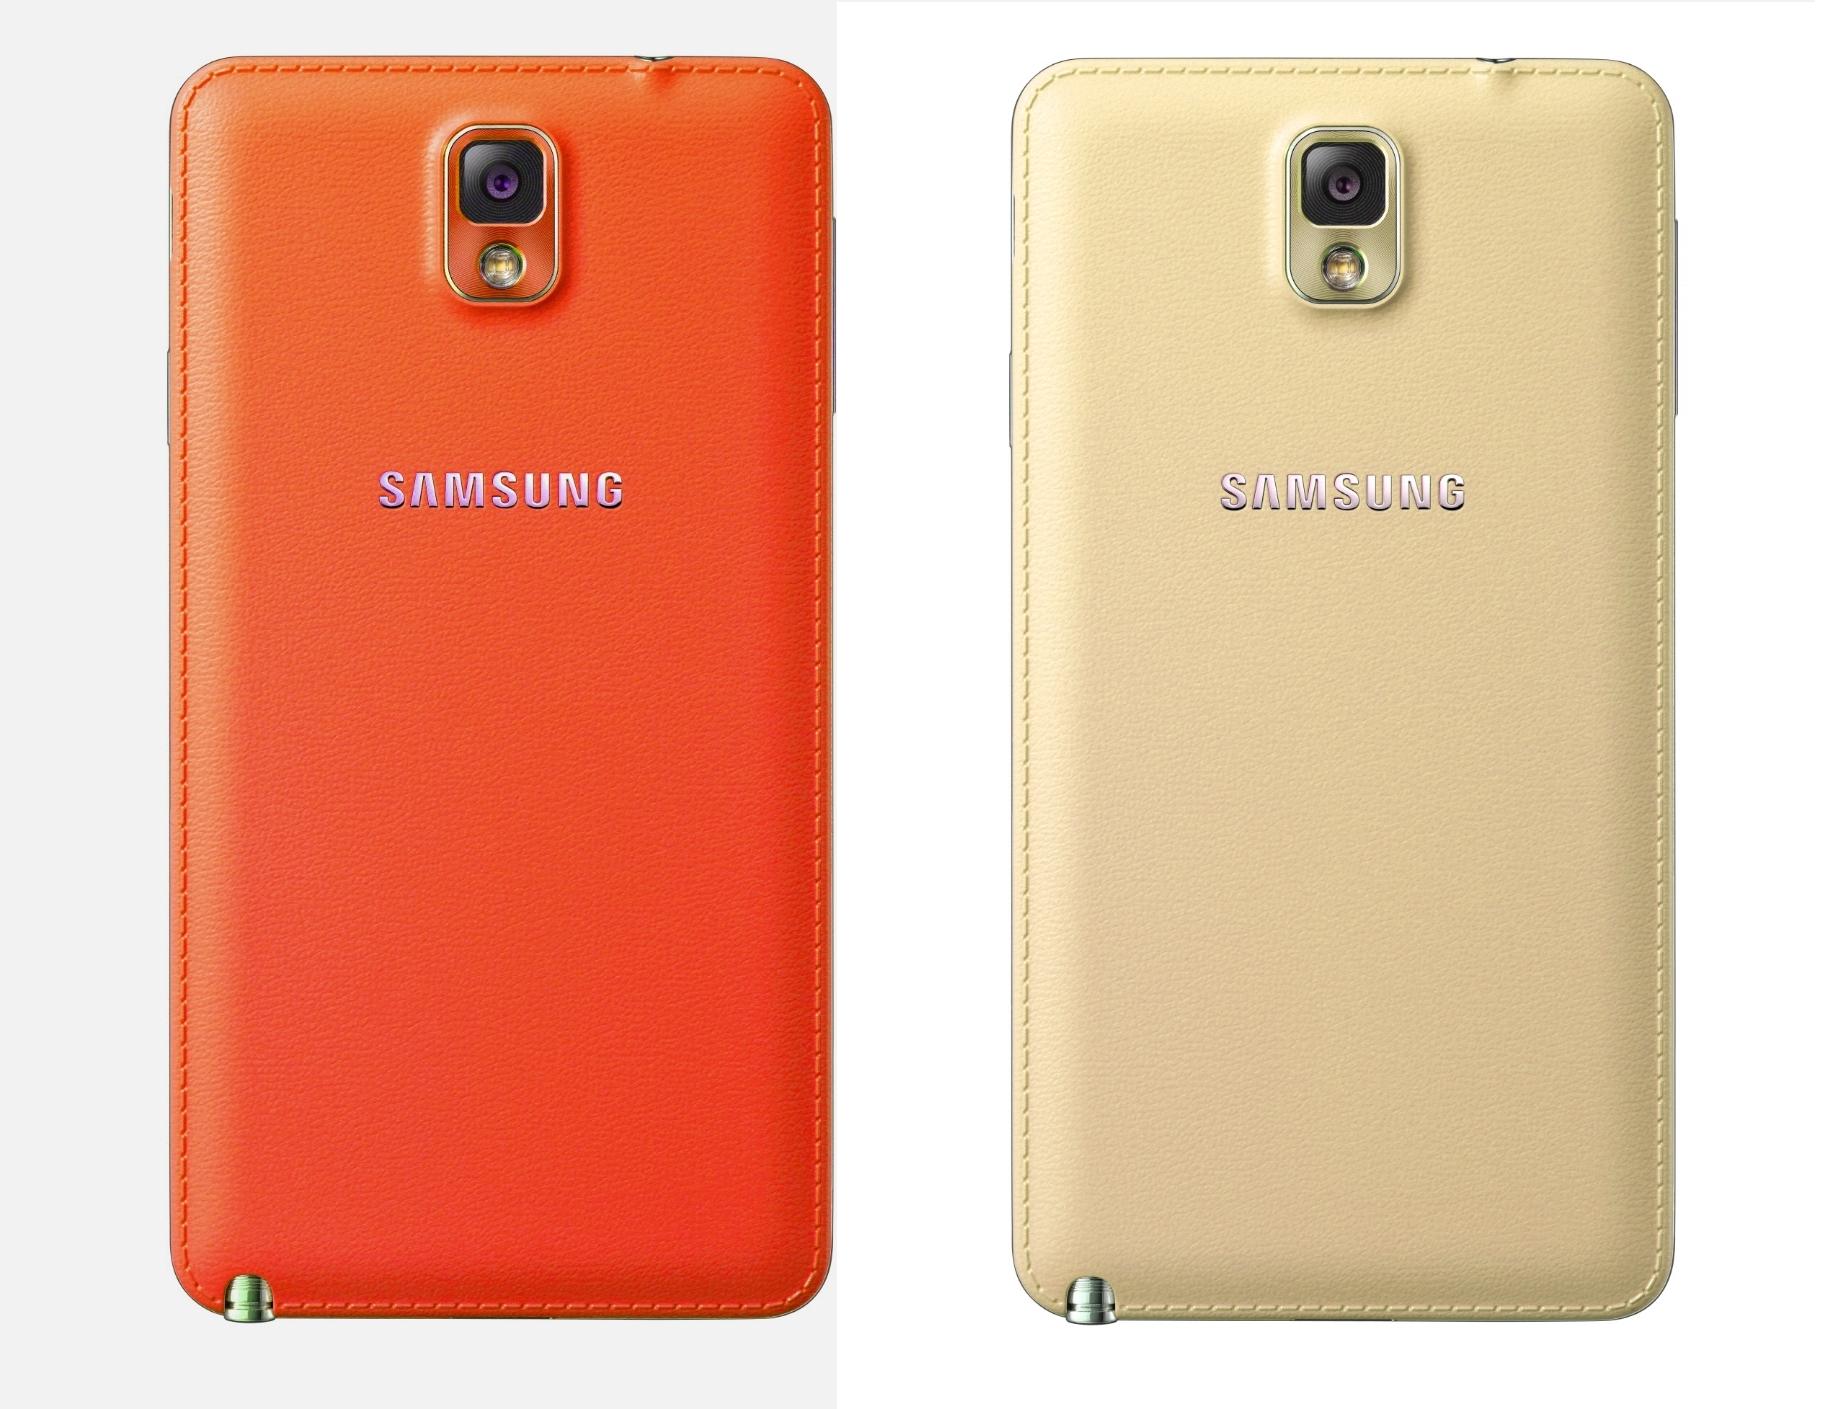 Samsung-Galaxy-Note-3-red gold render